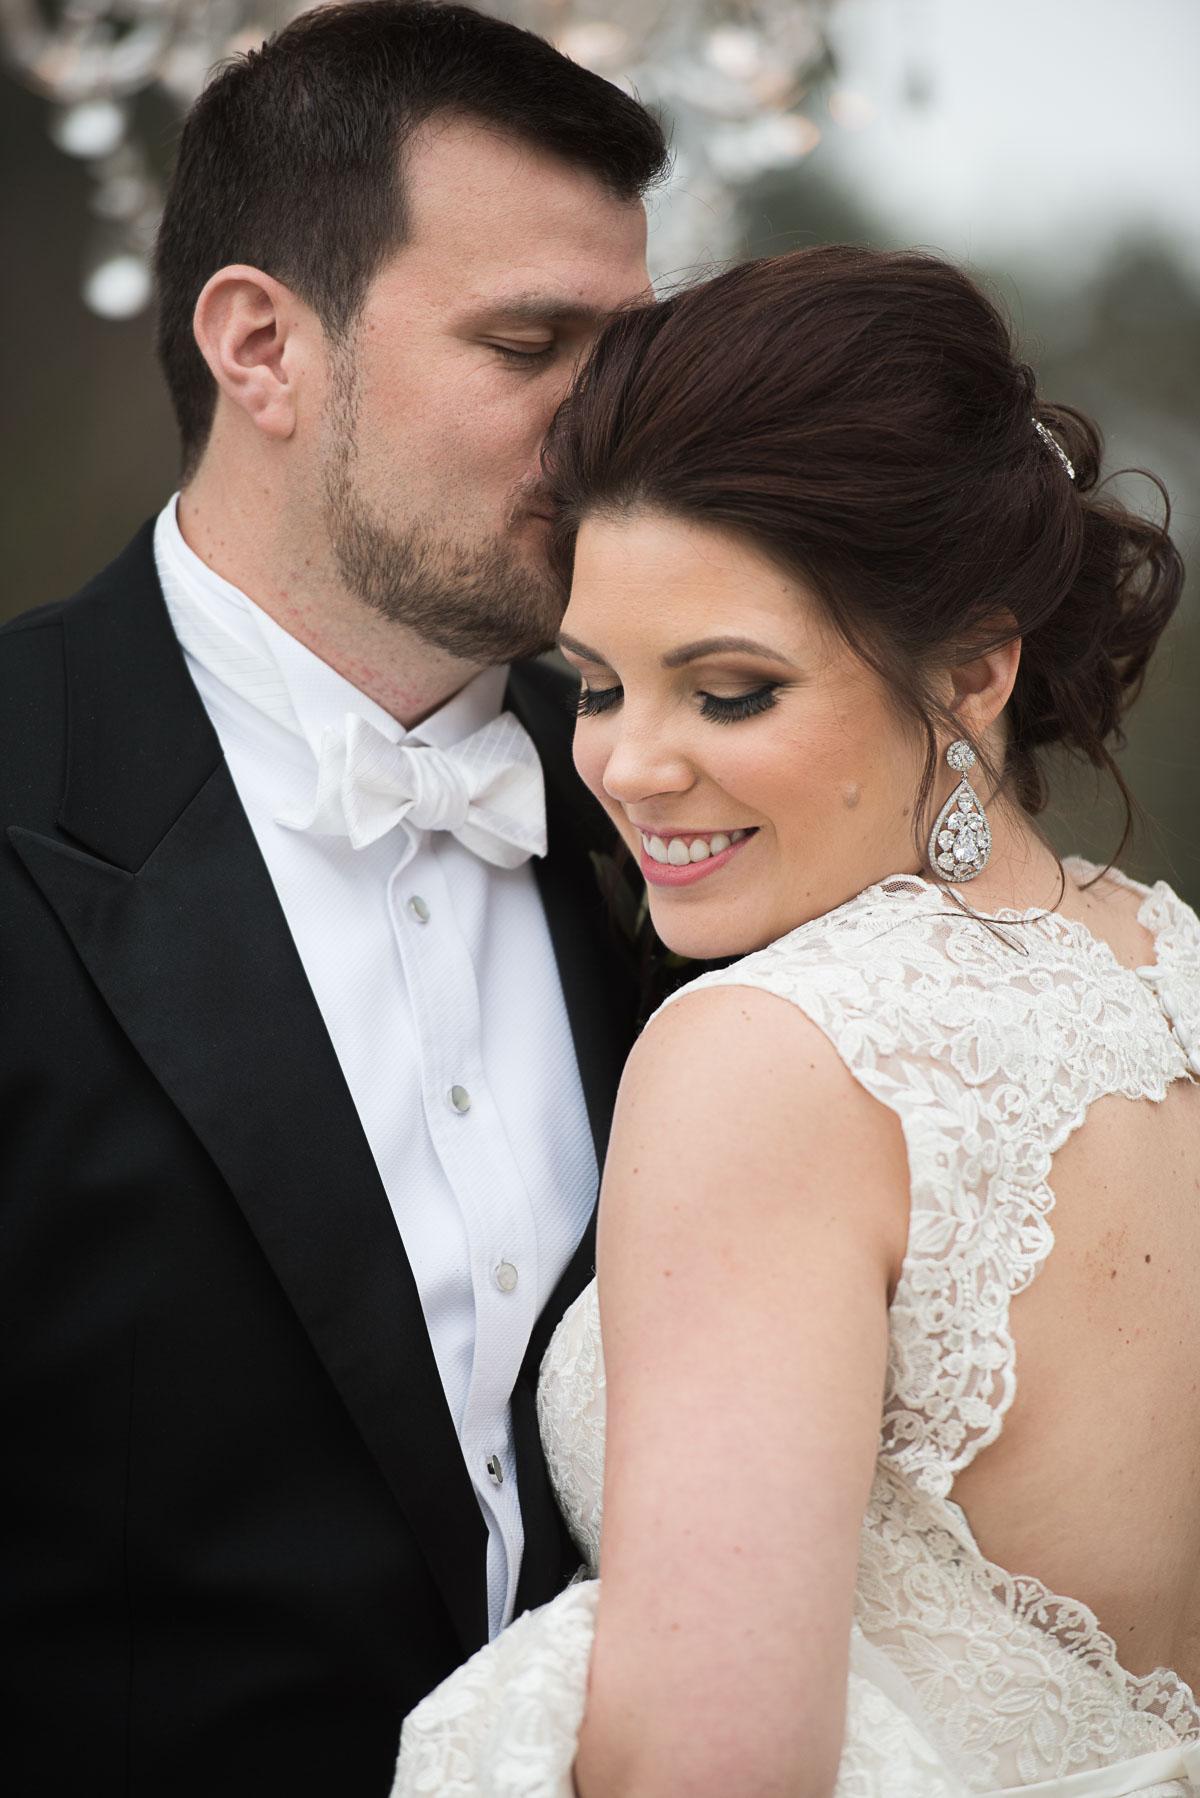 Austin Texas Wedding at the Terrace Club in Drippin Springs Fog in February-55.JPG